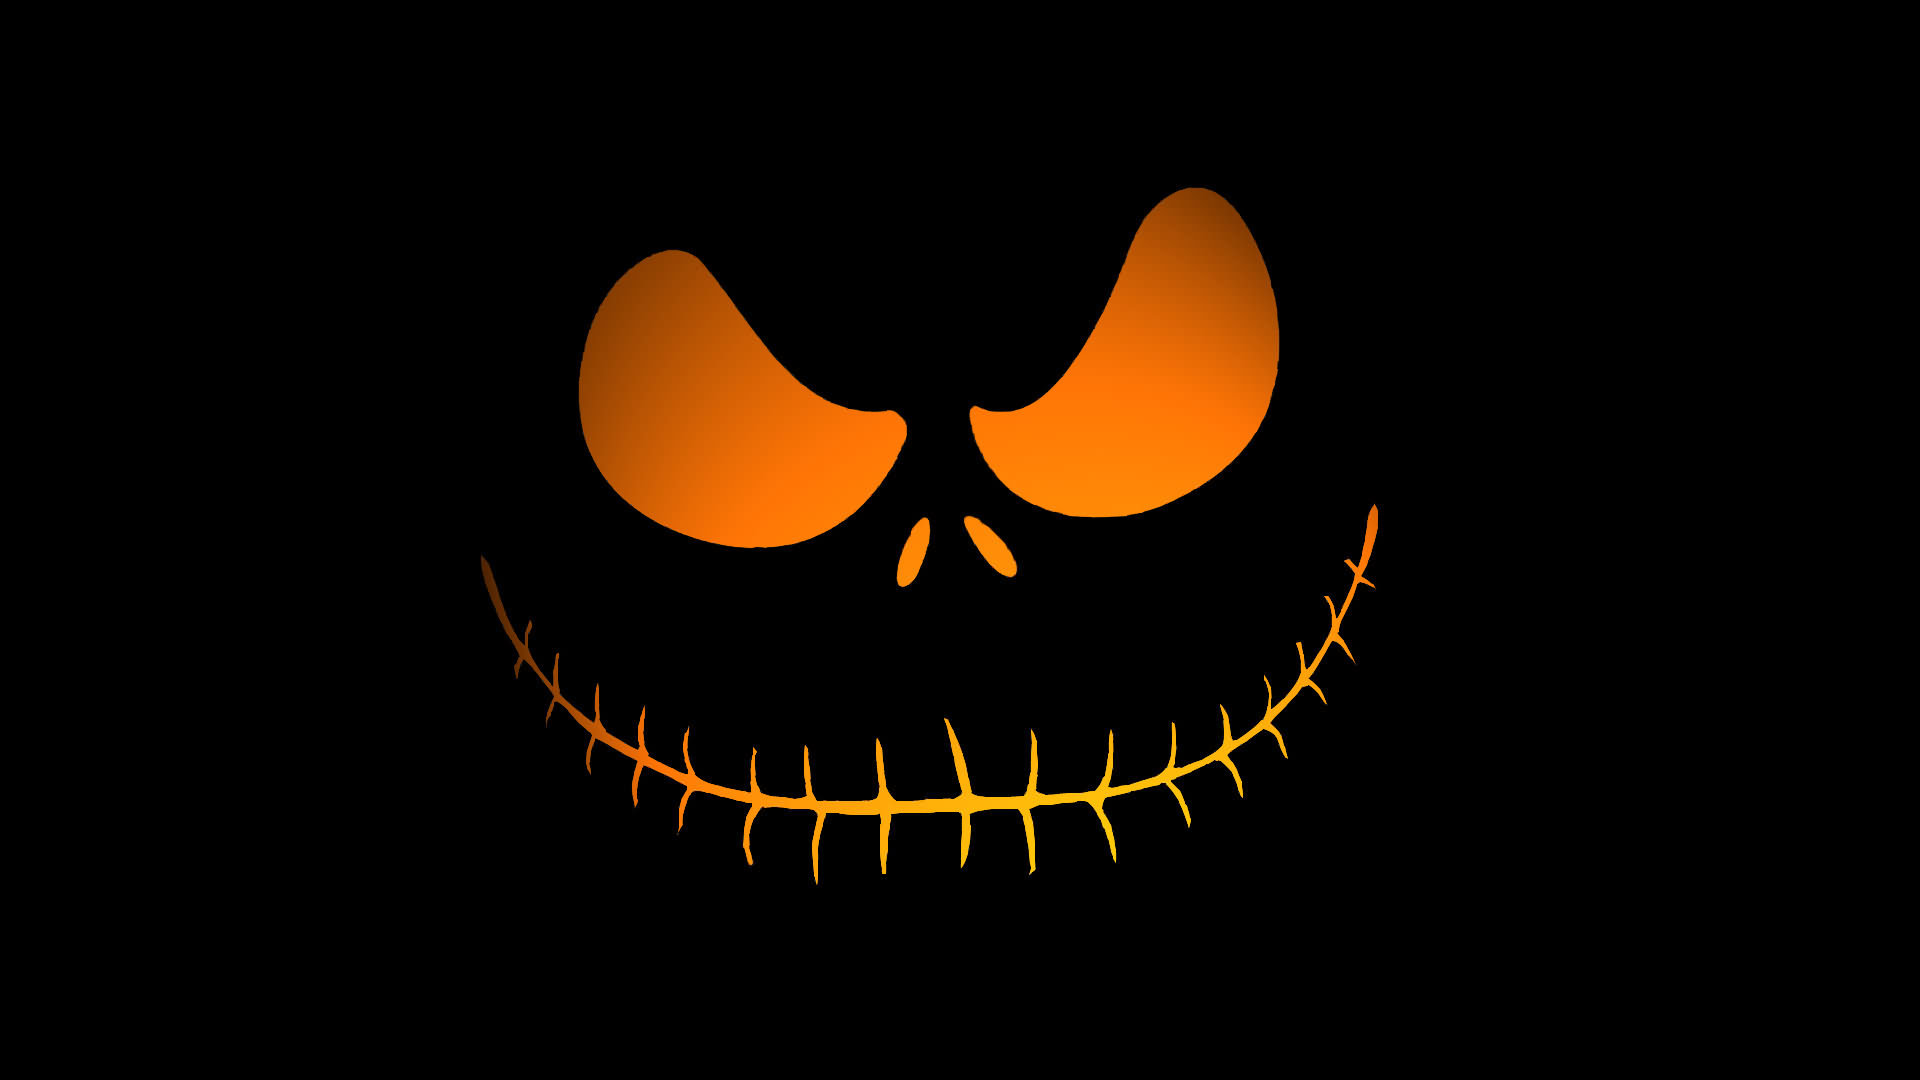 Too Scary Pumkin Halloween Day 2020